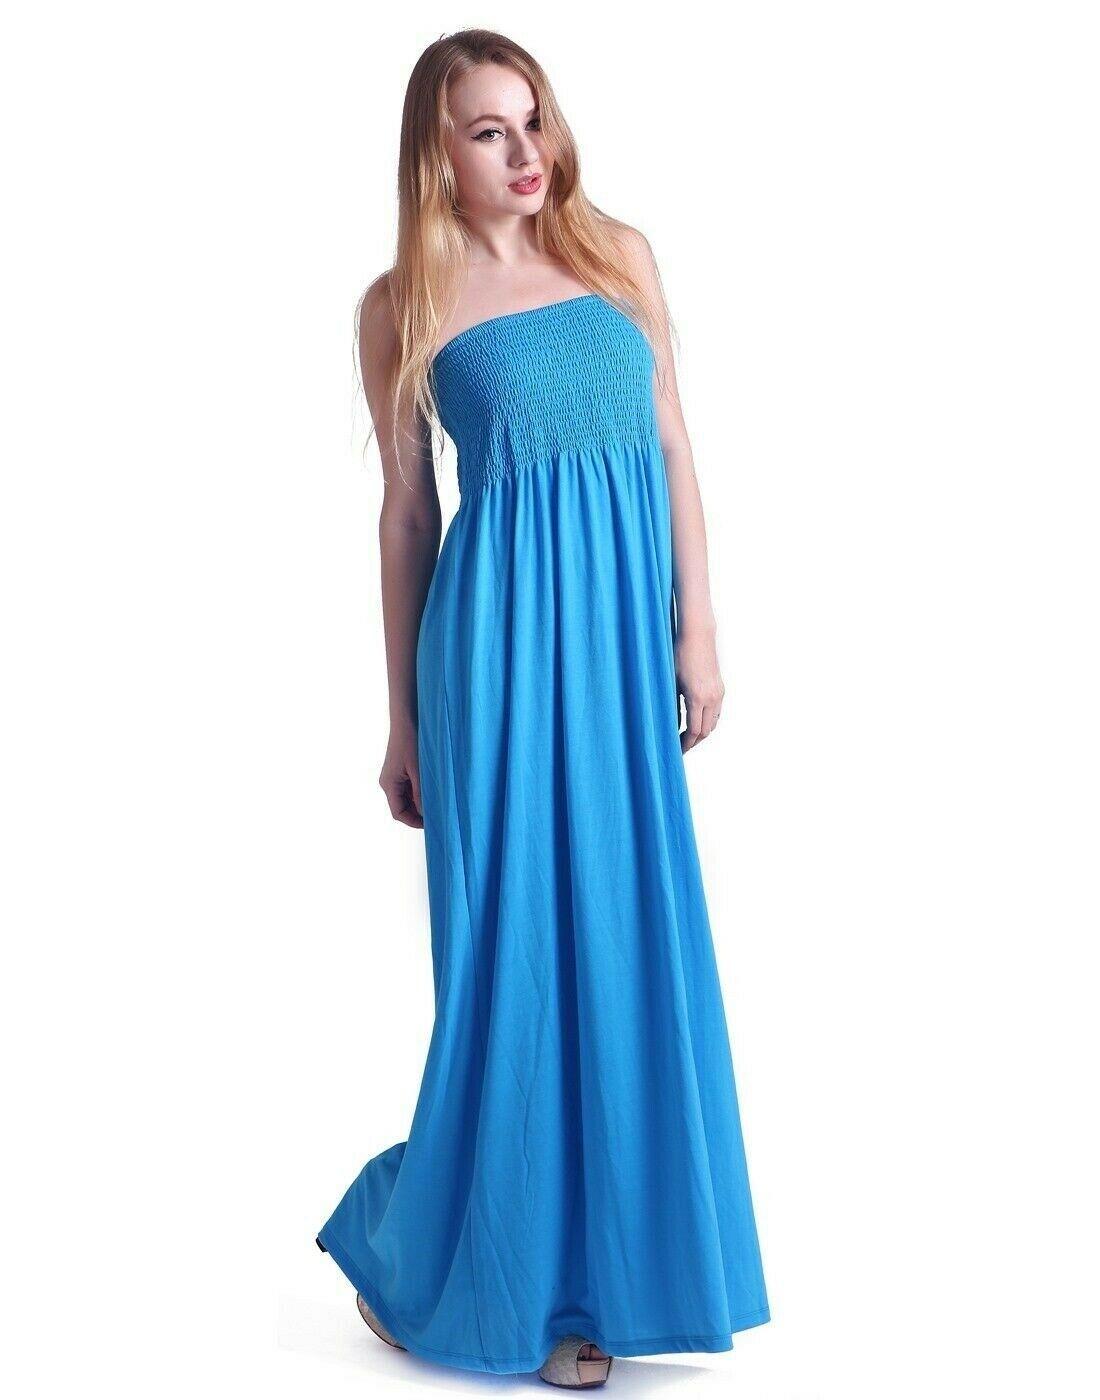 699e00dcbd Women's Strapless Maxi Dress Plus Size Tube Top Long Skirt Sundress ...